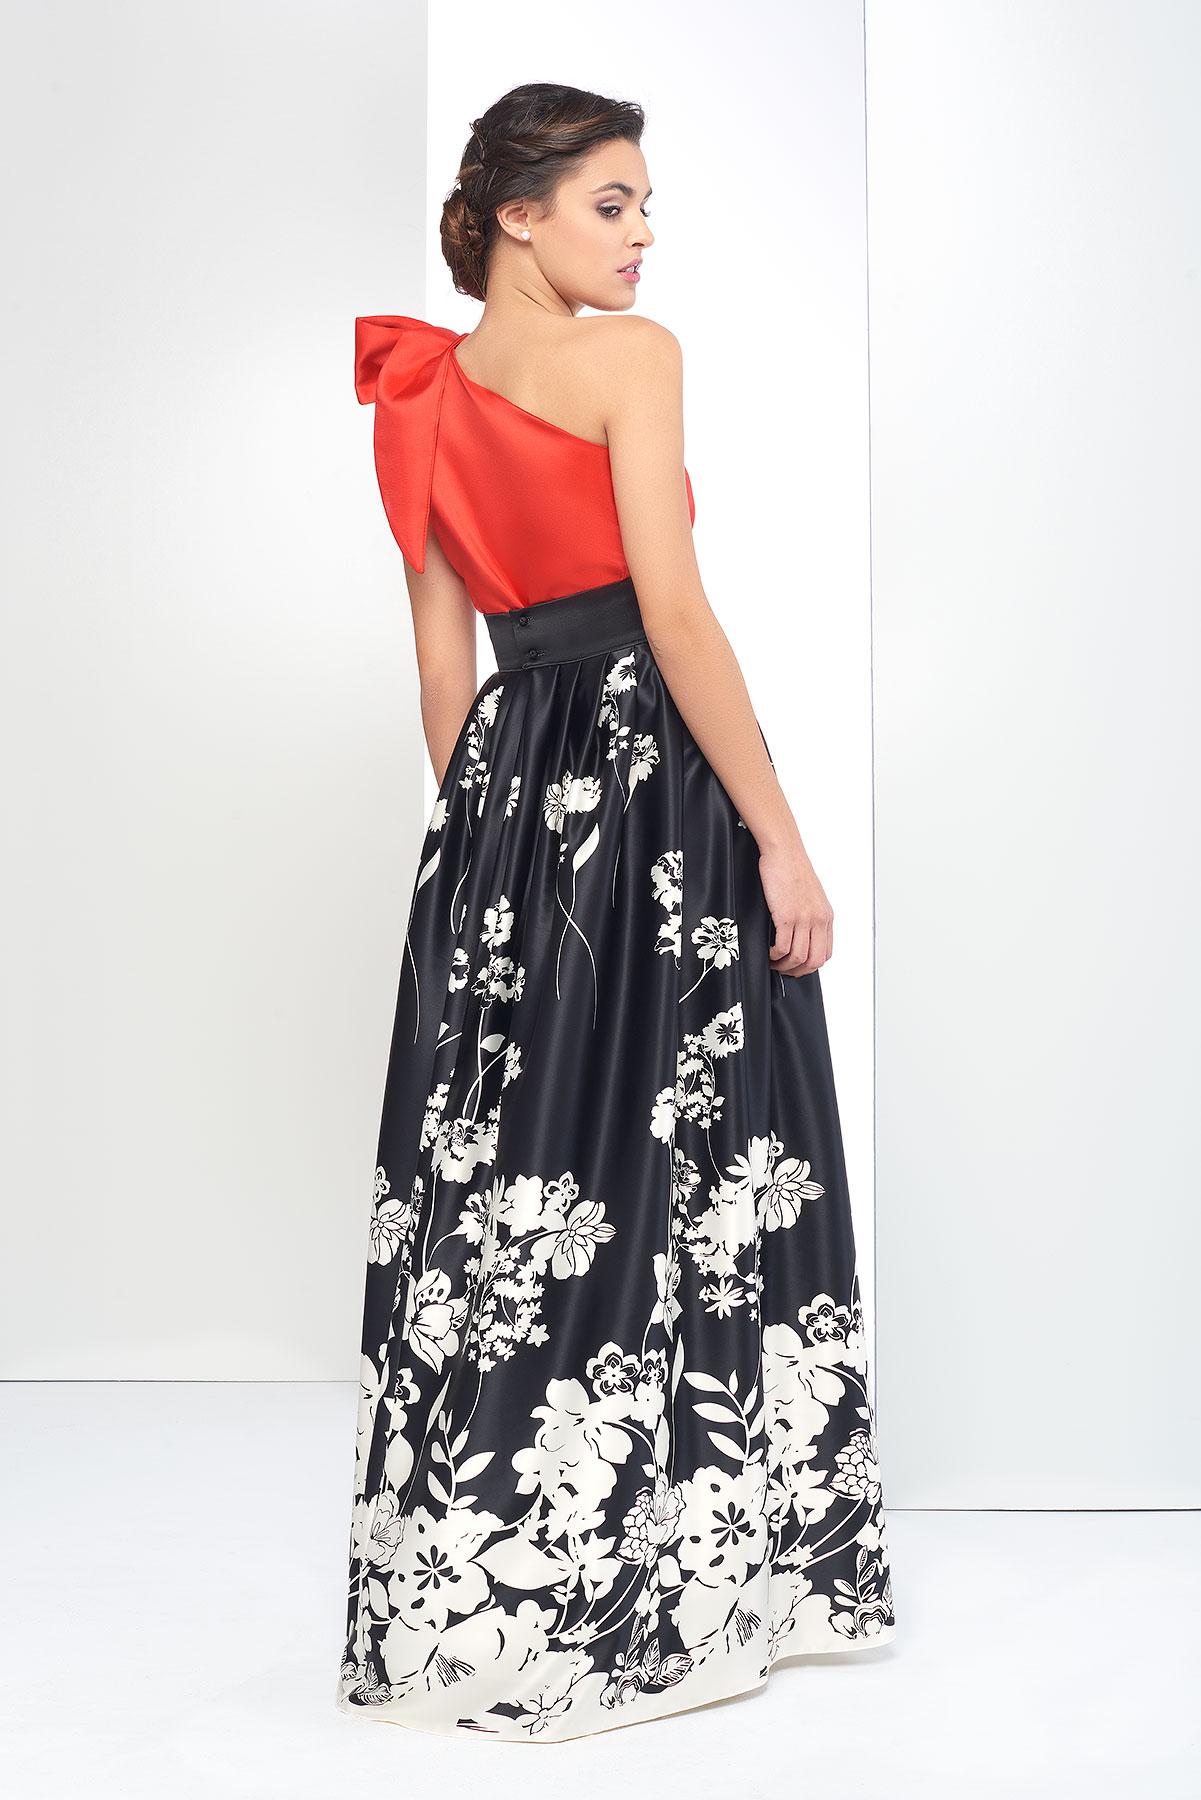 8ff167e77 Falda de fiesta larga negra con estampado de flores. Para eventos.